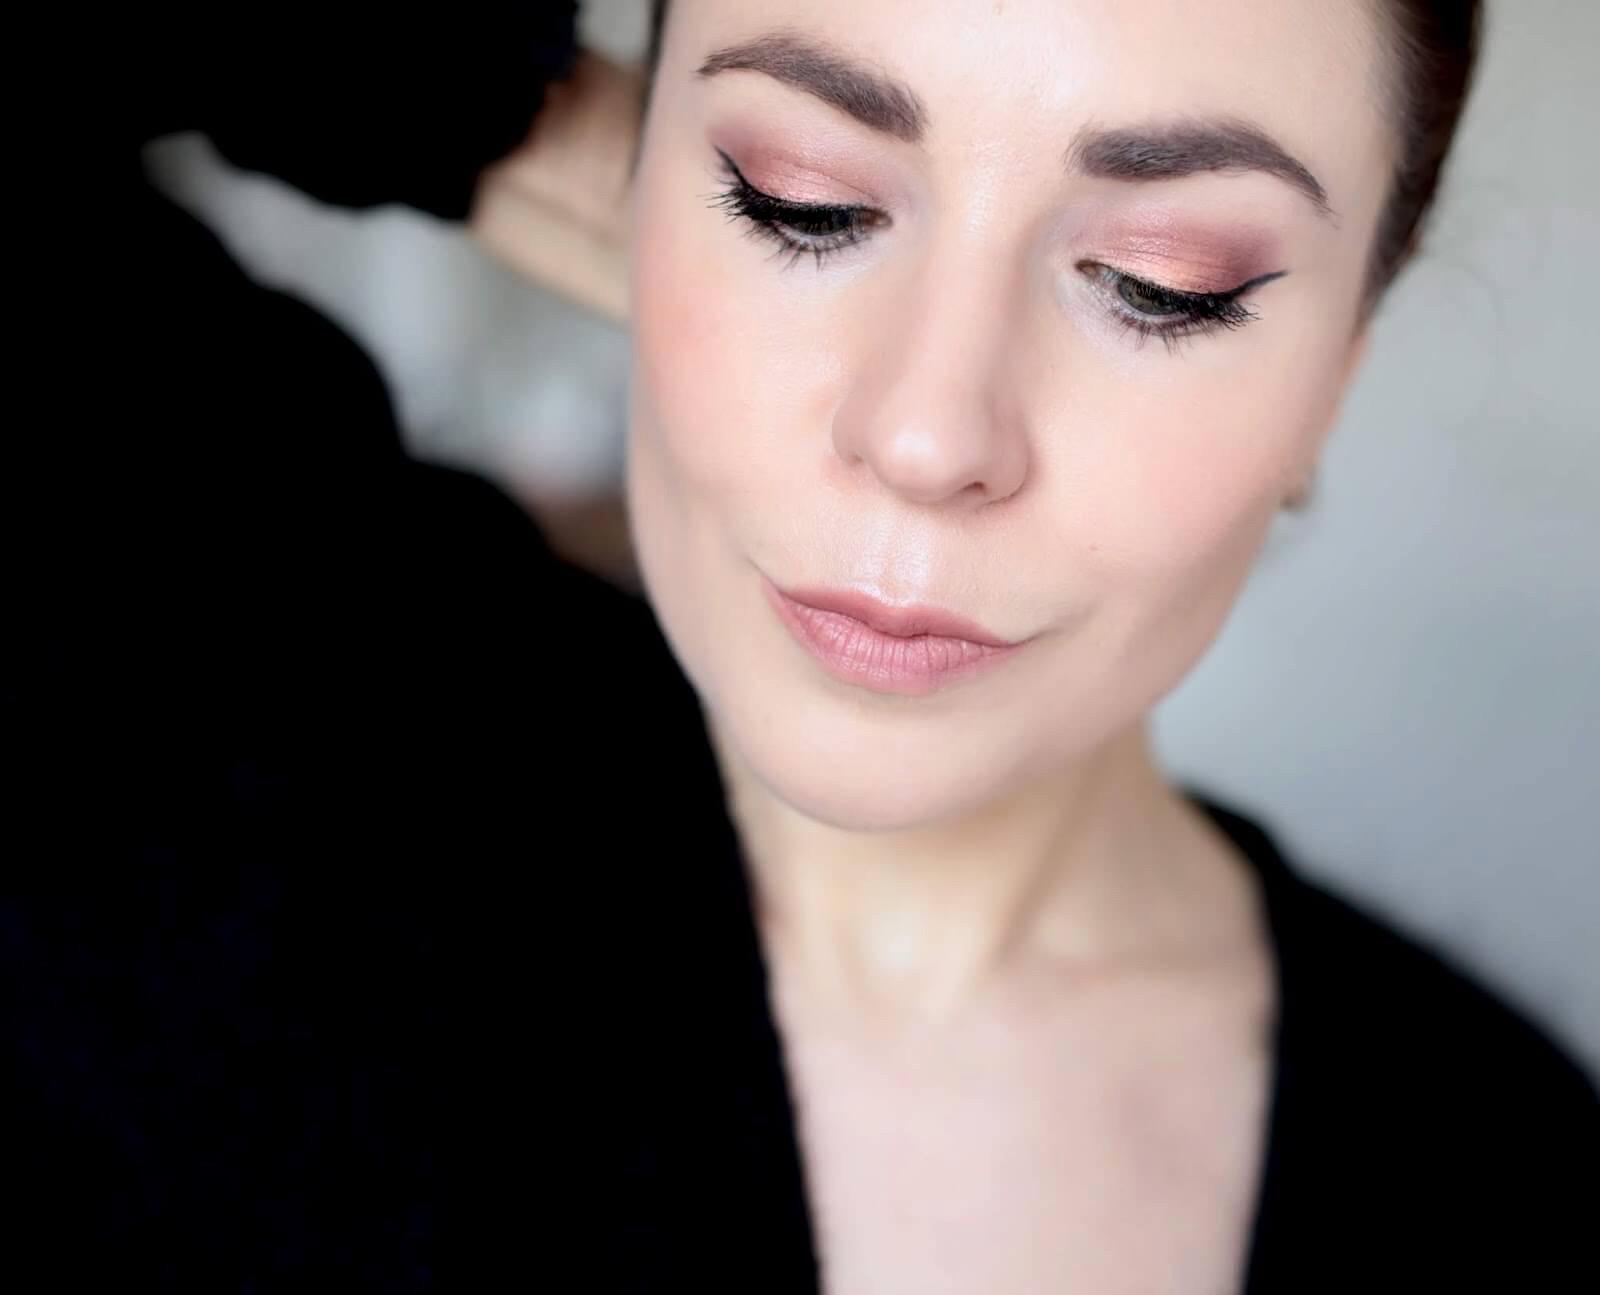 shiseido maquillage avis